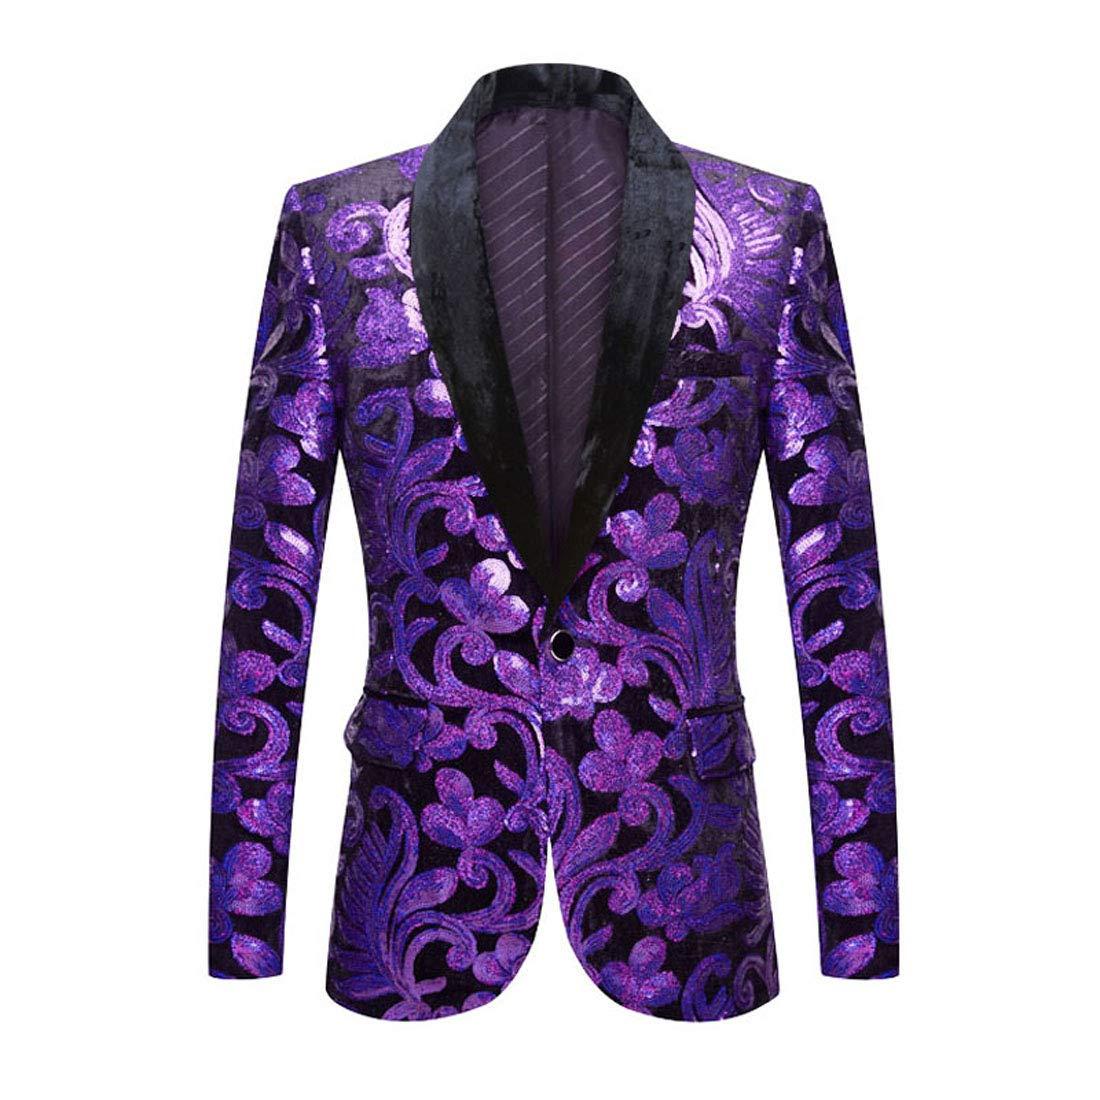 PYJTRL Men Fashion Velvet Sequins Floral Pattern Suit Jacket Blazer (Purple, XXXL/48R) by PYJTRL